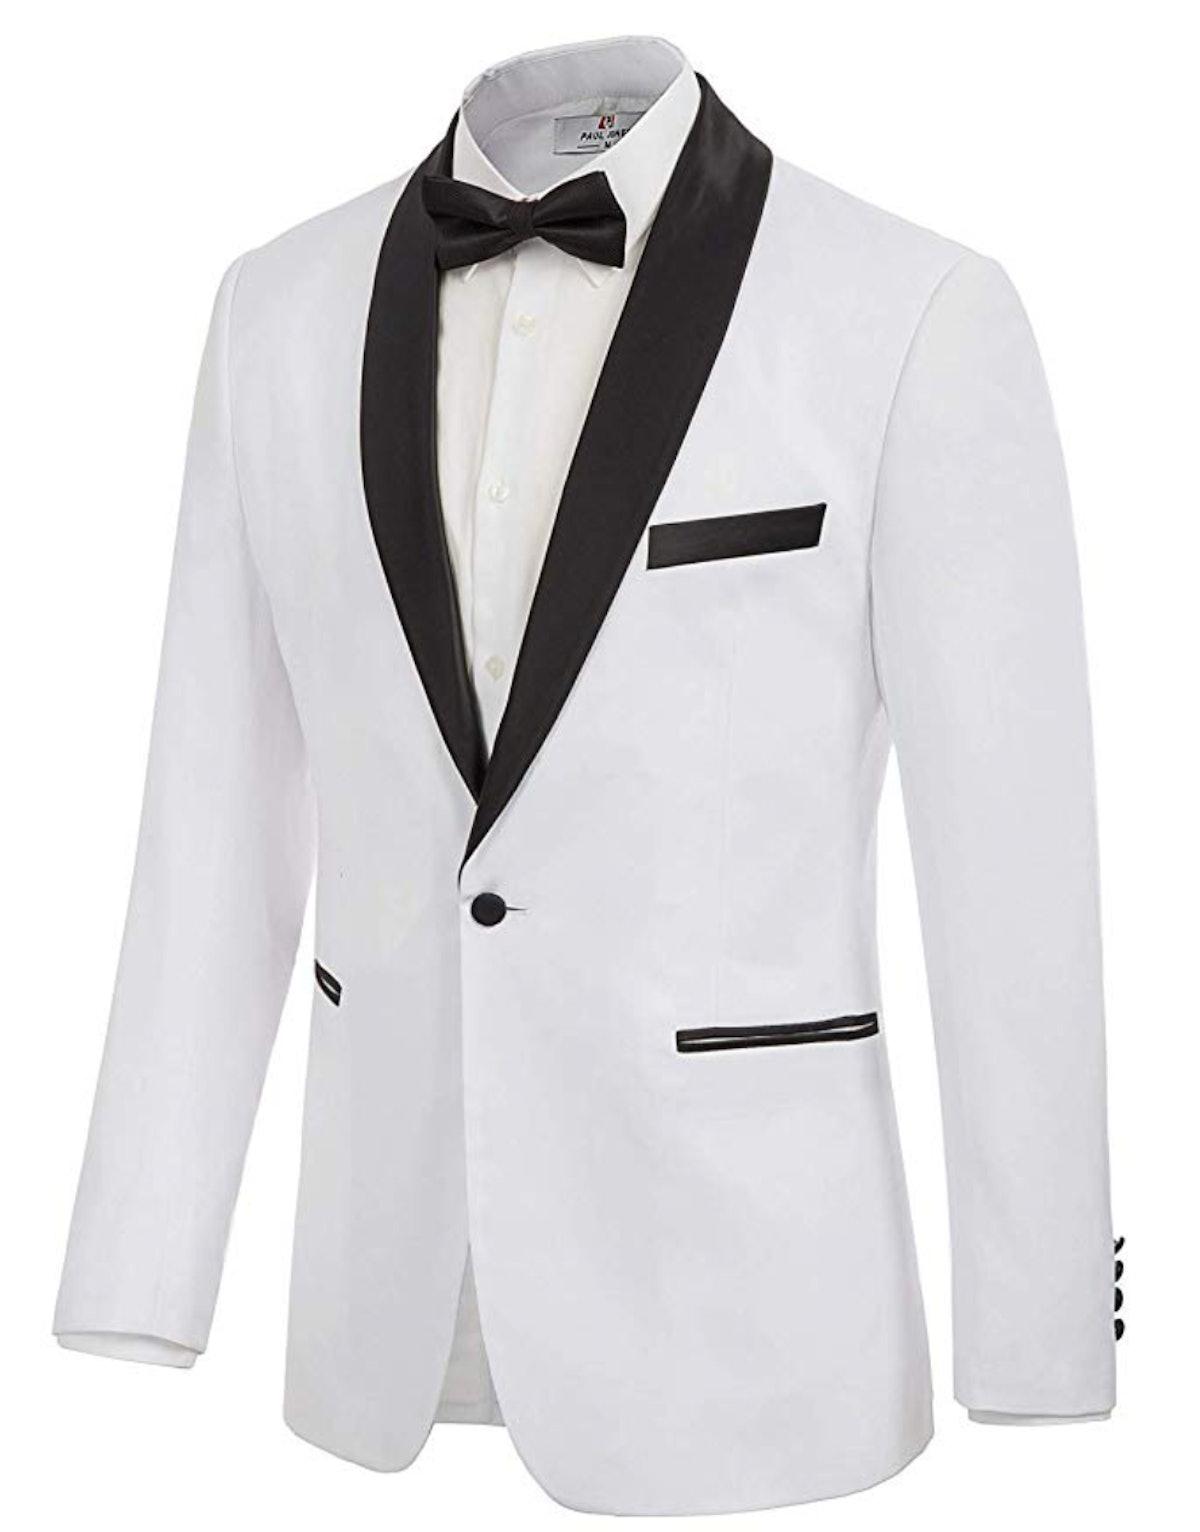 PAUL JONES Men's Prom Tuxedo Jacket Satin Shawl Lapel Slim Fit Blazer Suit